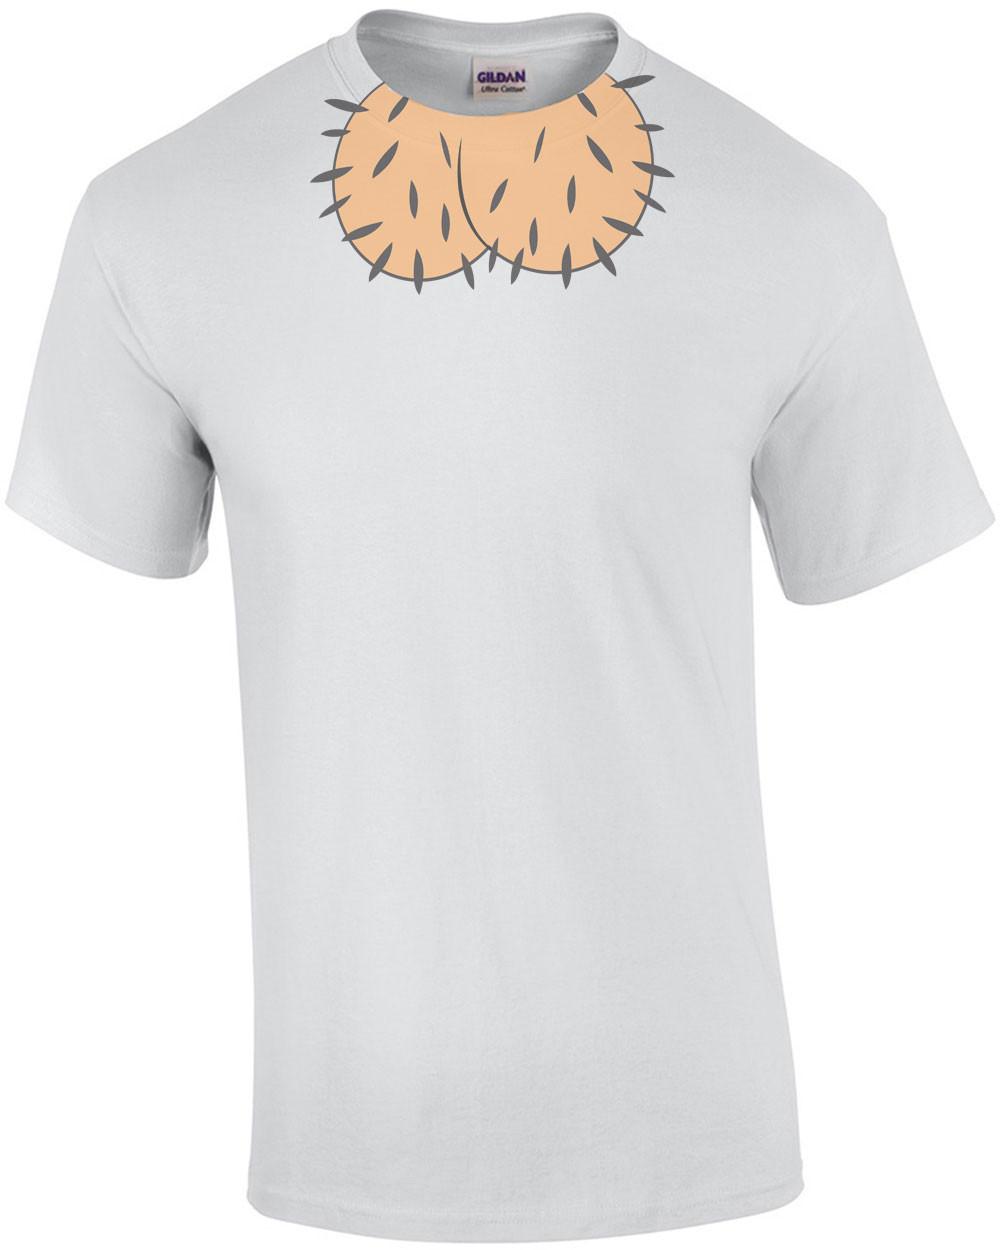 Chin Balls T-Shirt